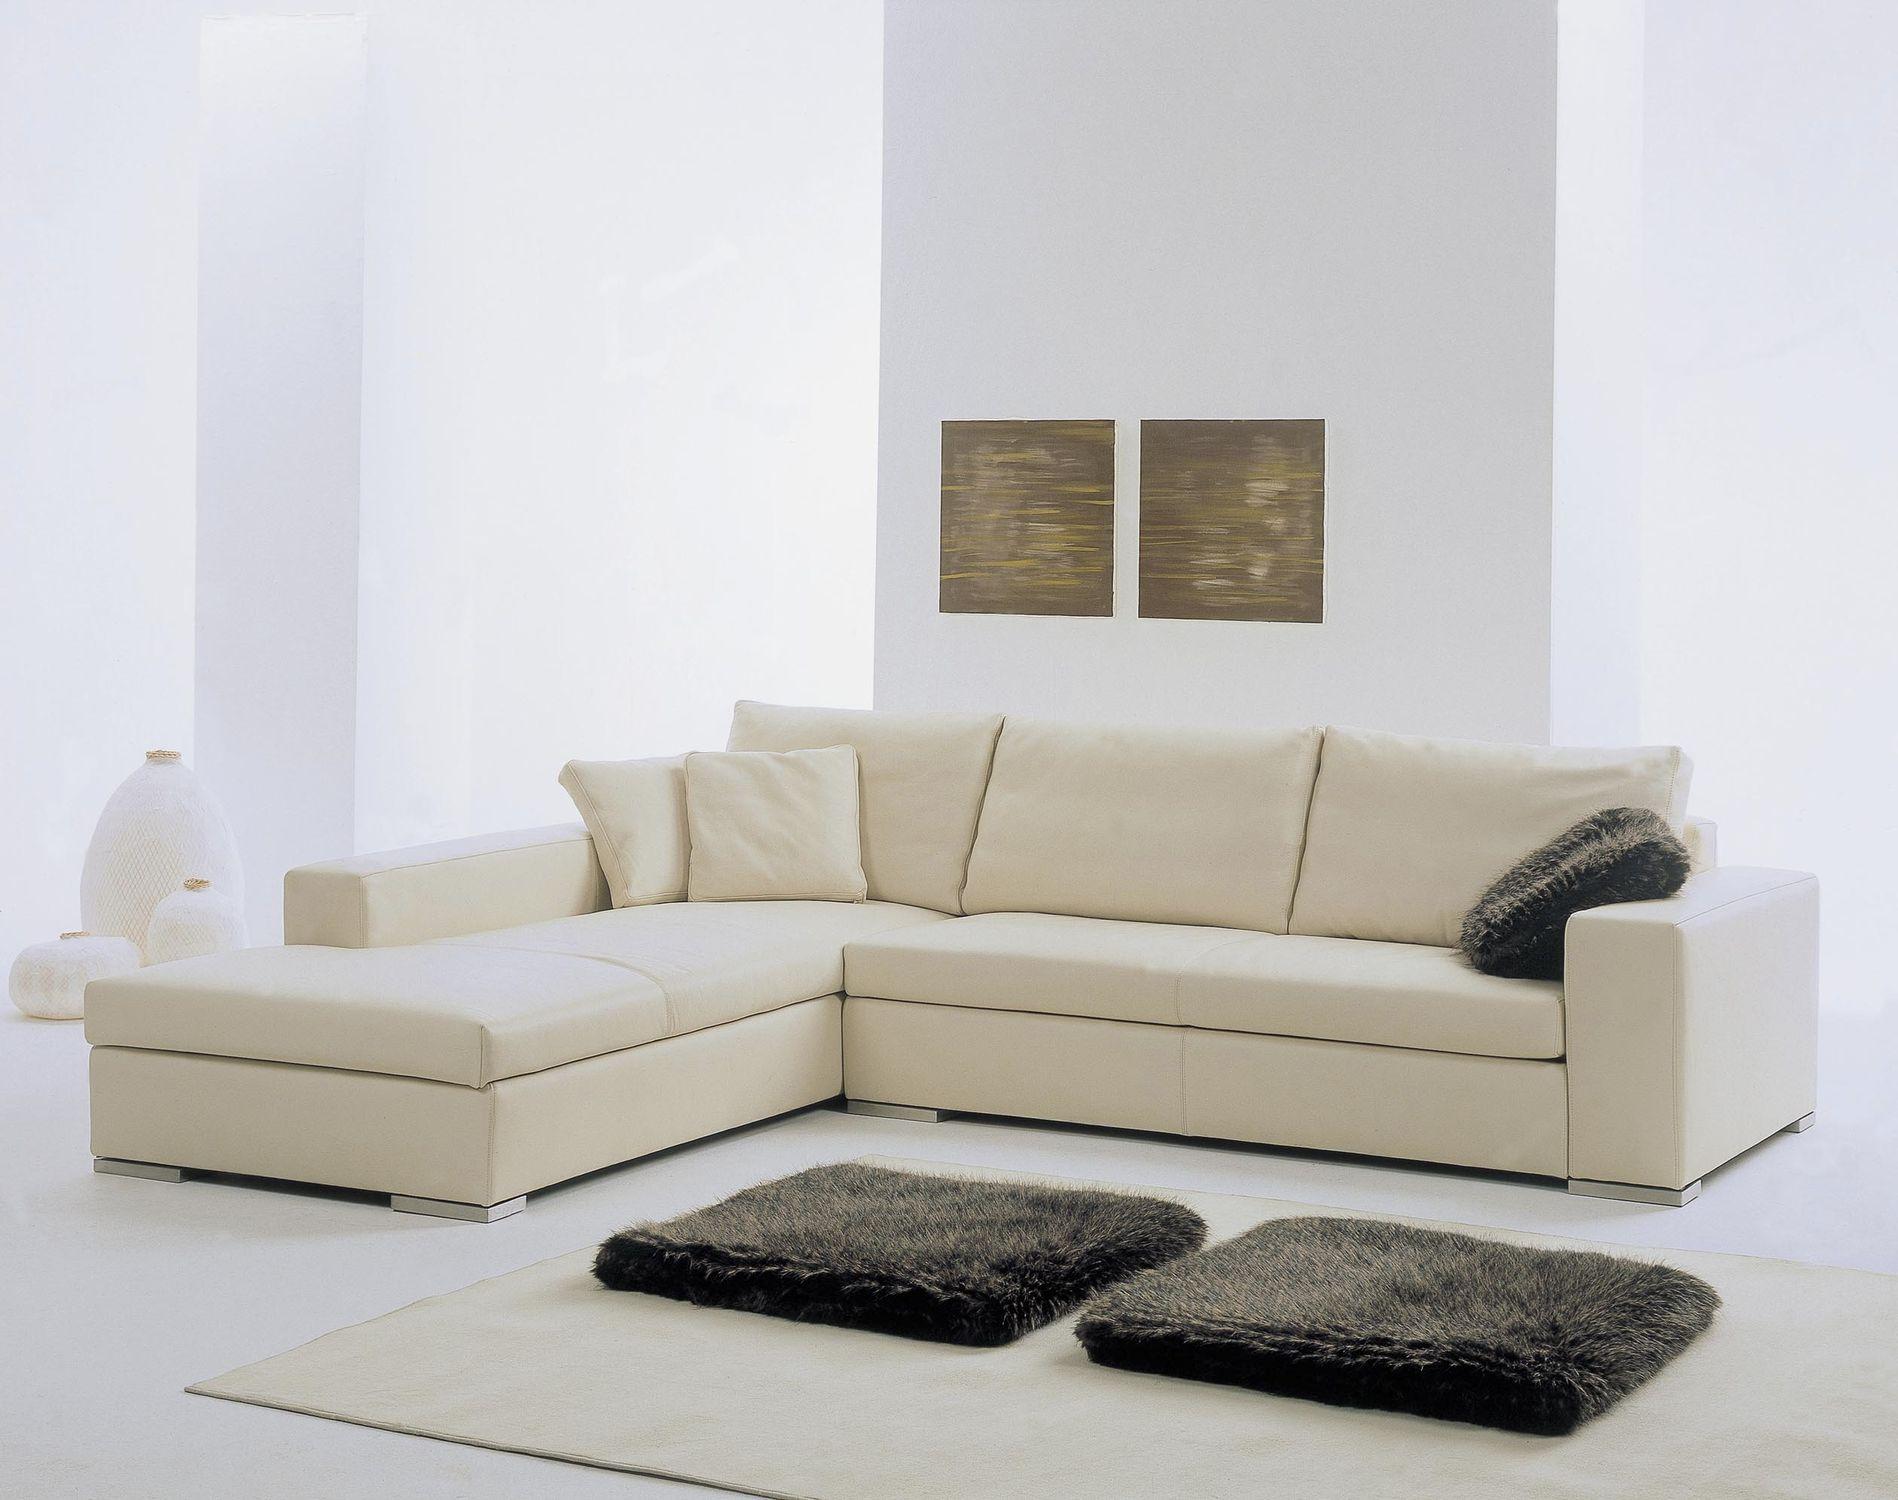 Divano d\'angolo / modulare / moderno / in tessuto - DOMINO - Gyform